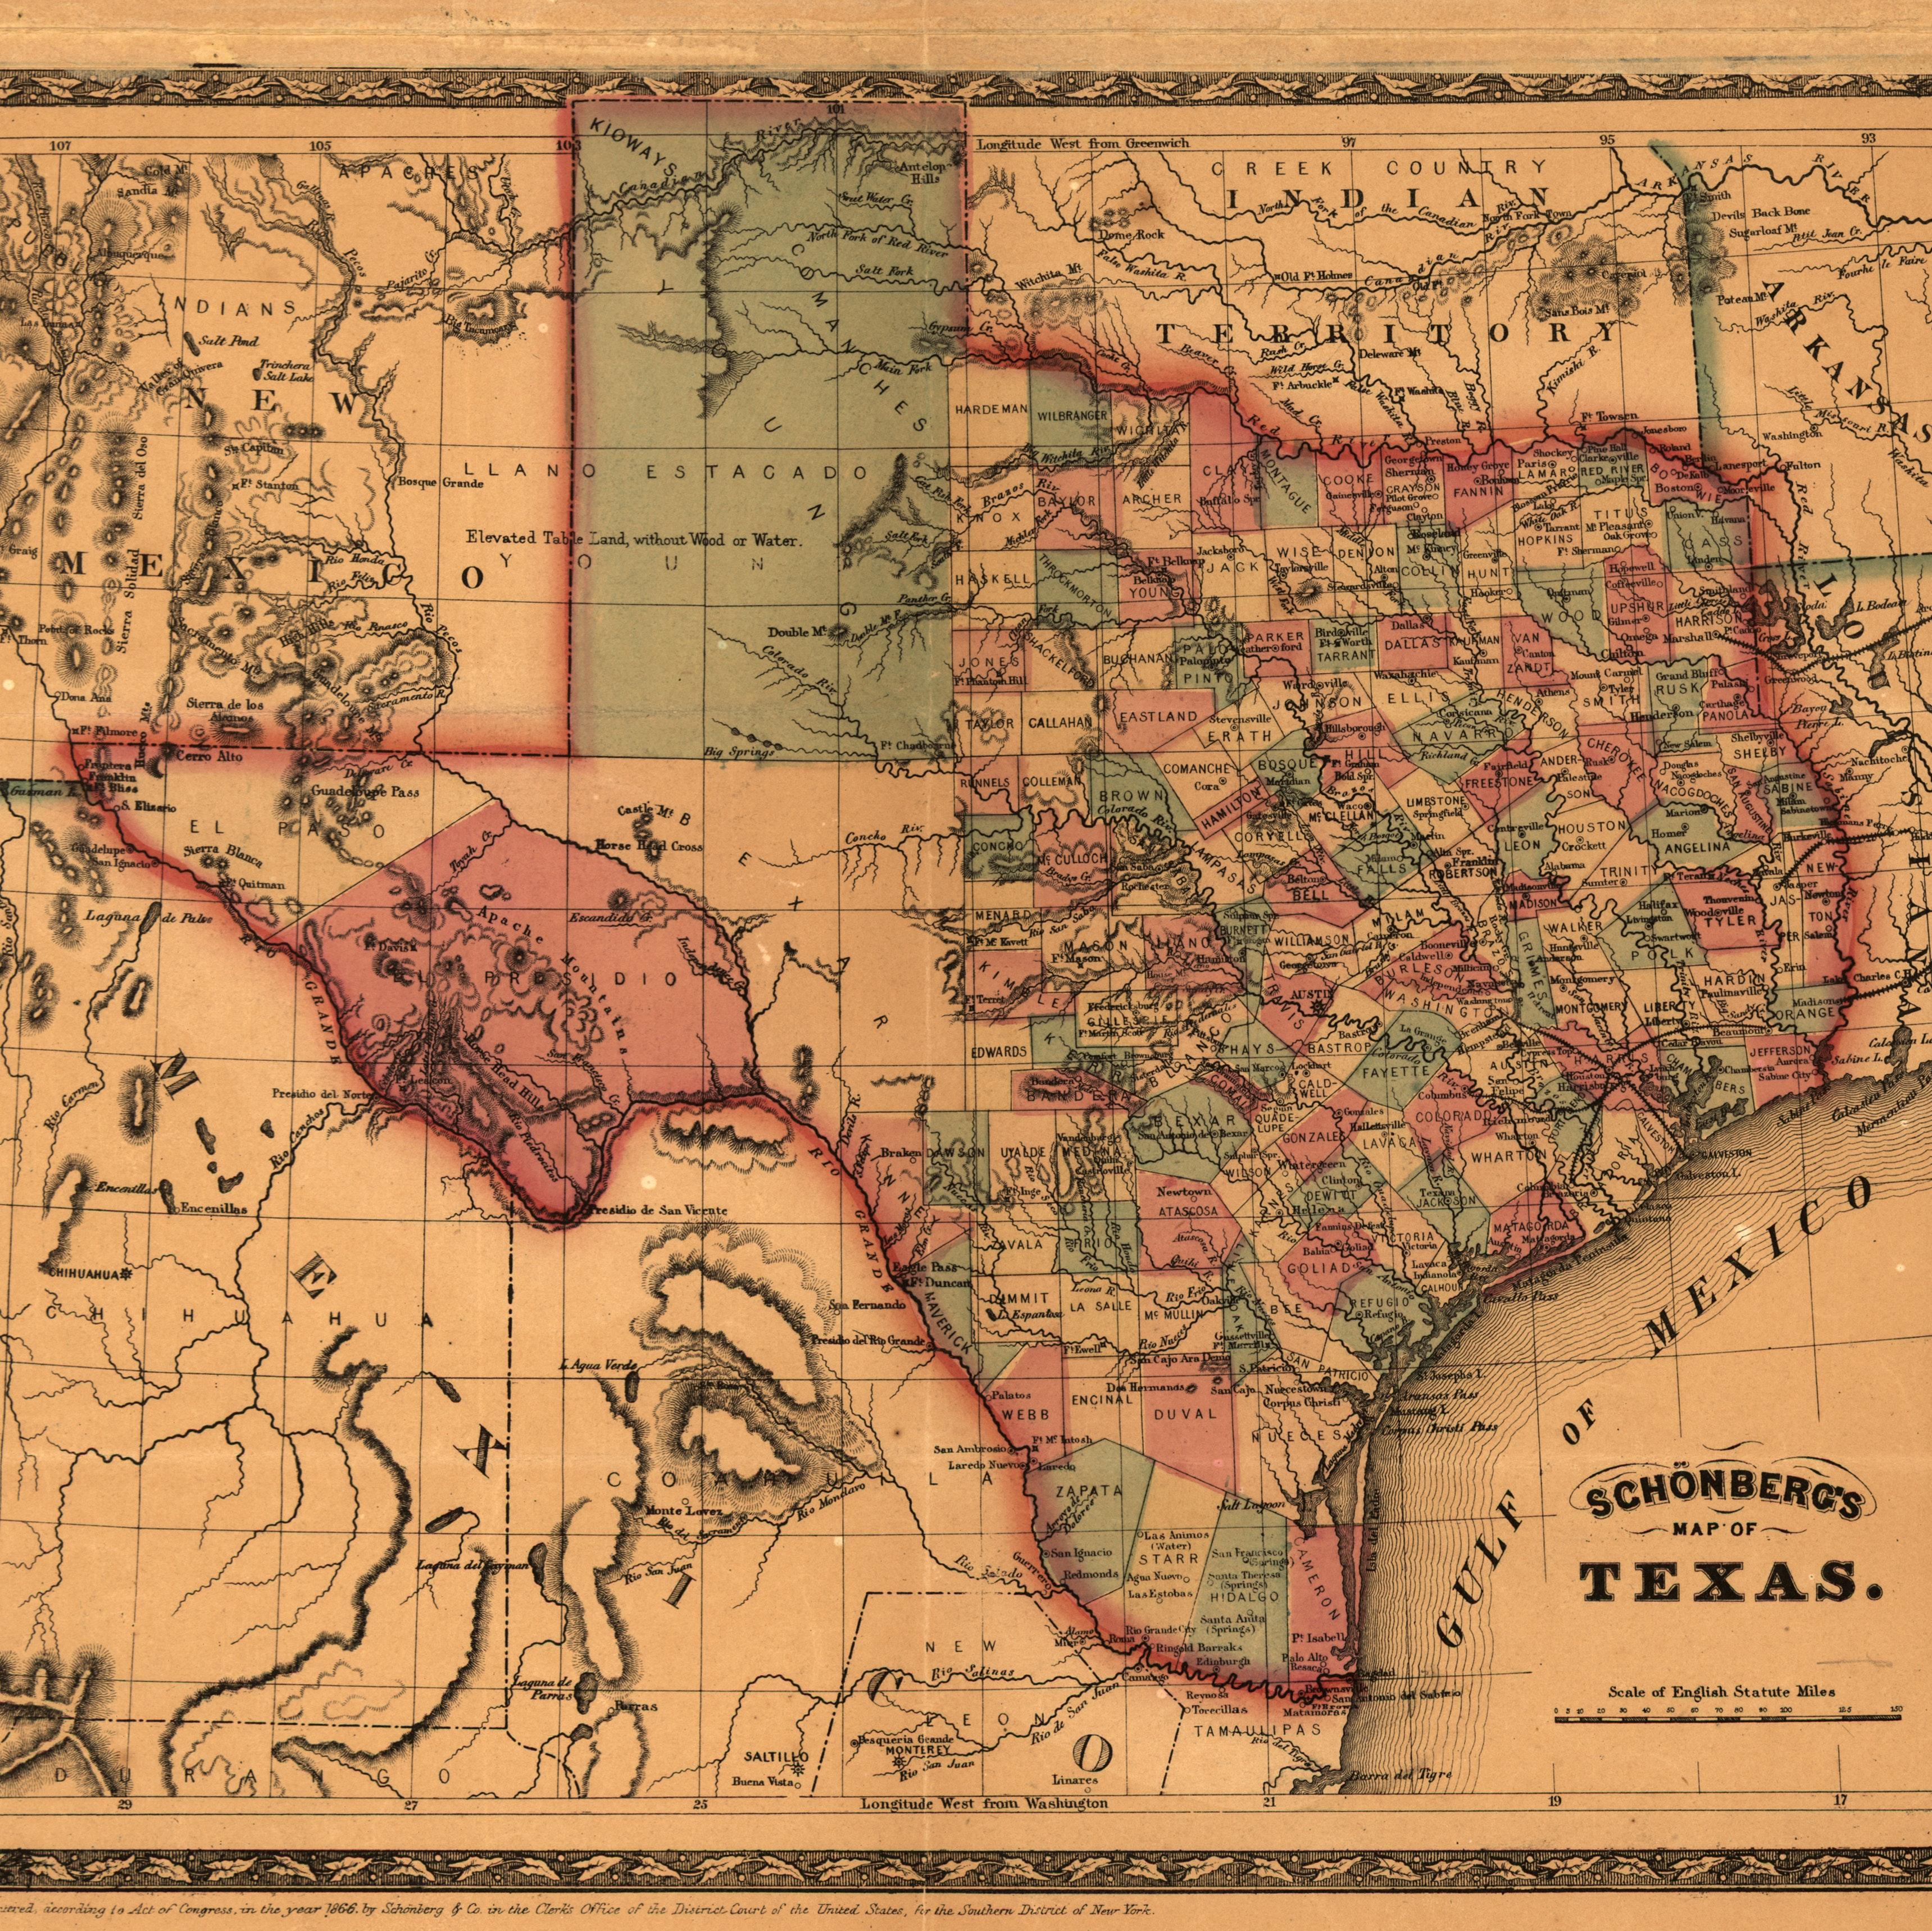 Schönberg's map of Texas, 1866. Courtesy Library of Congress.